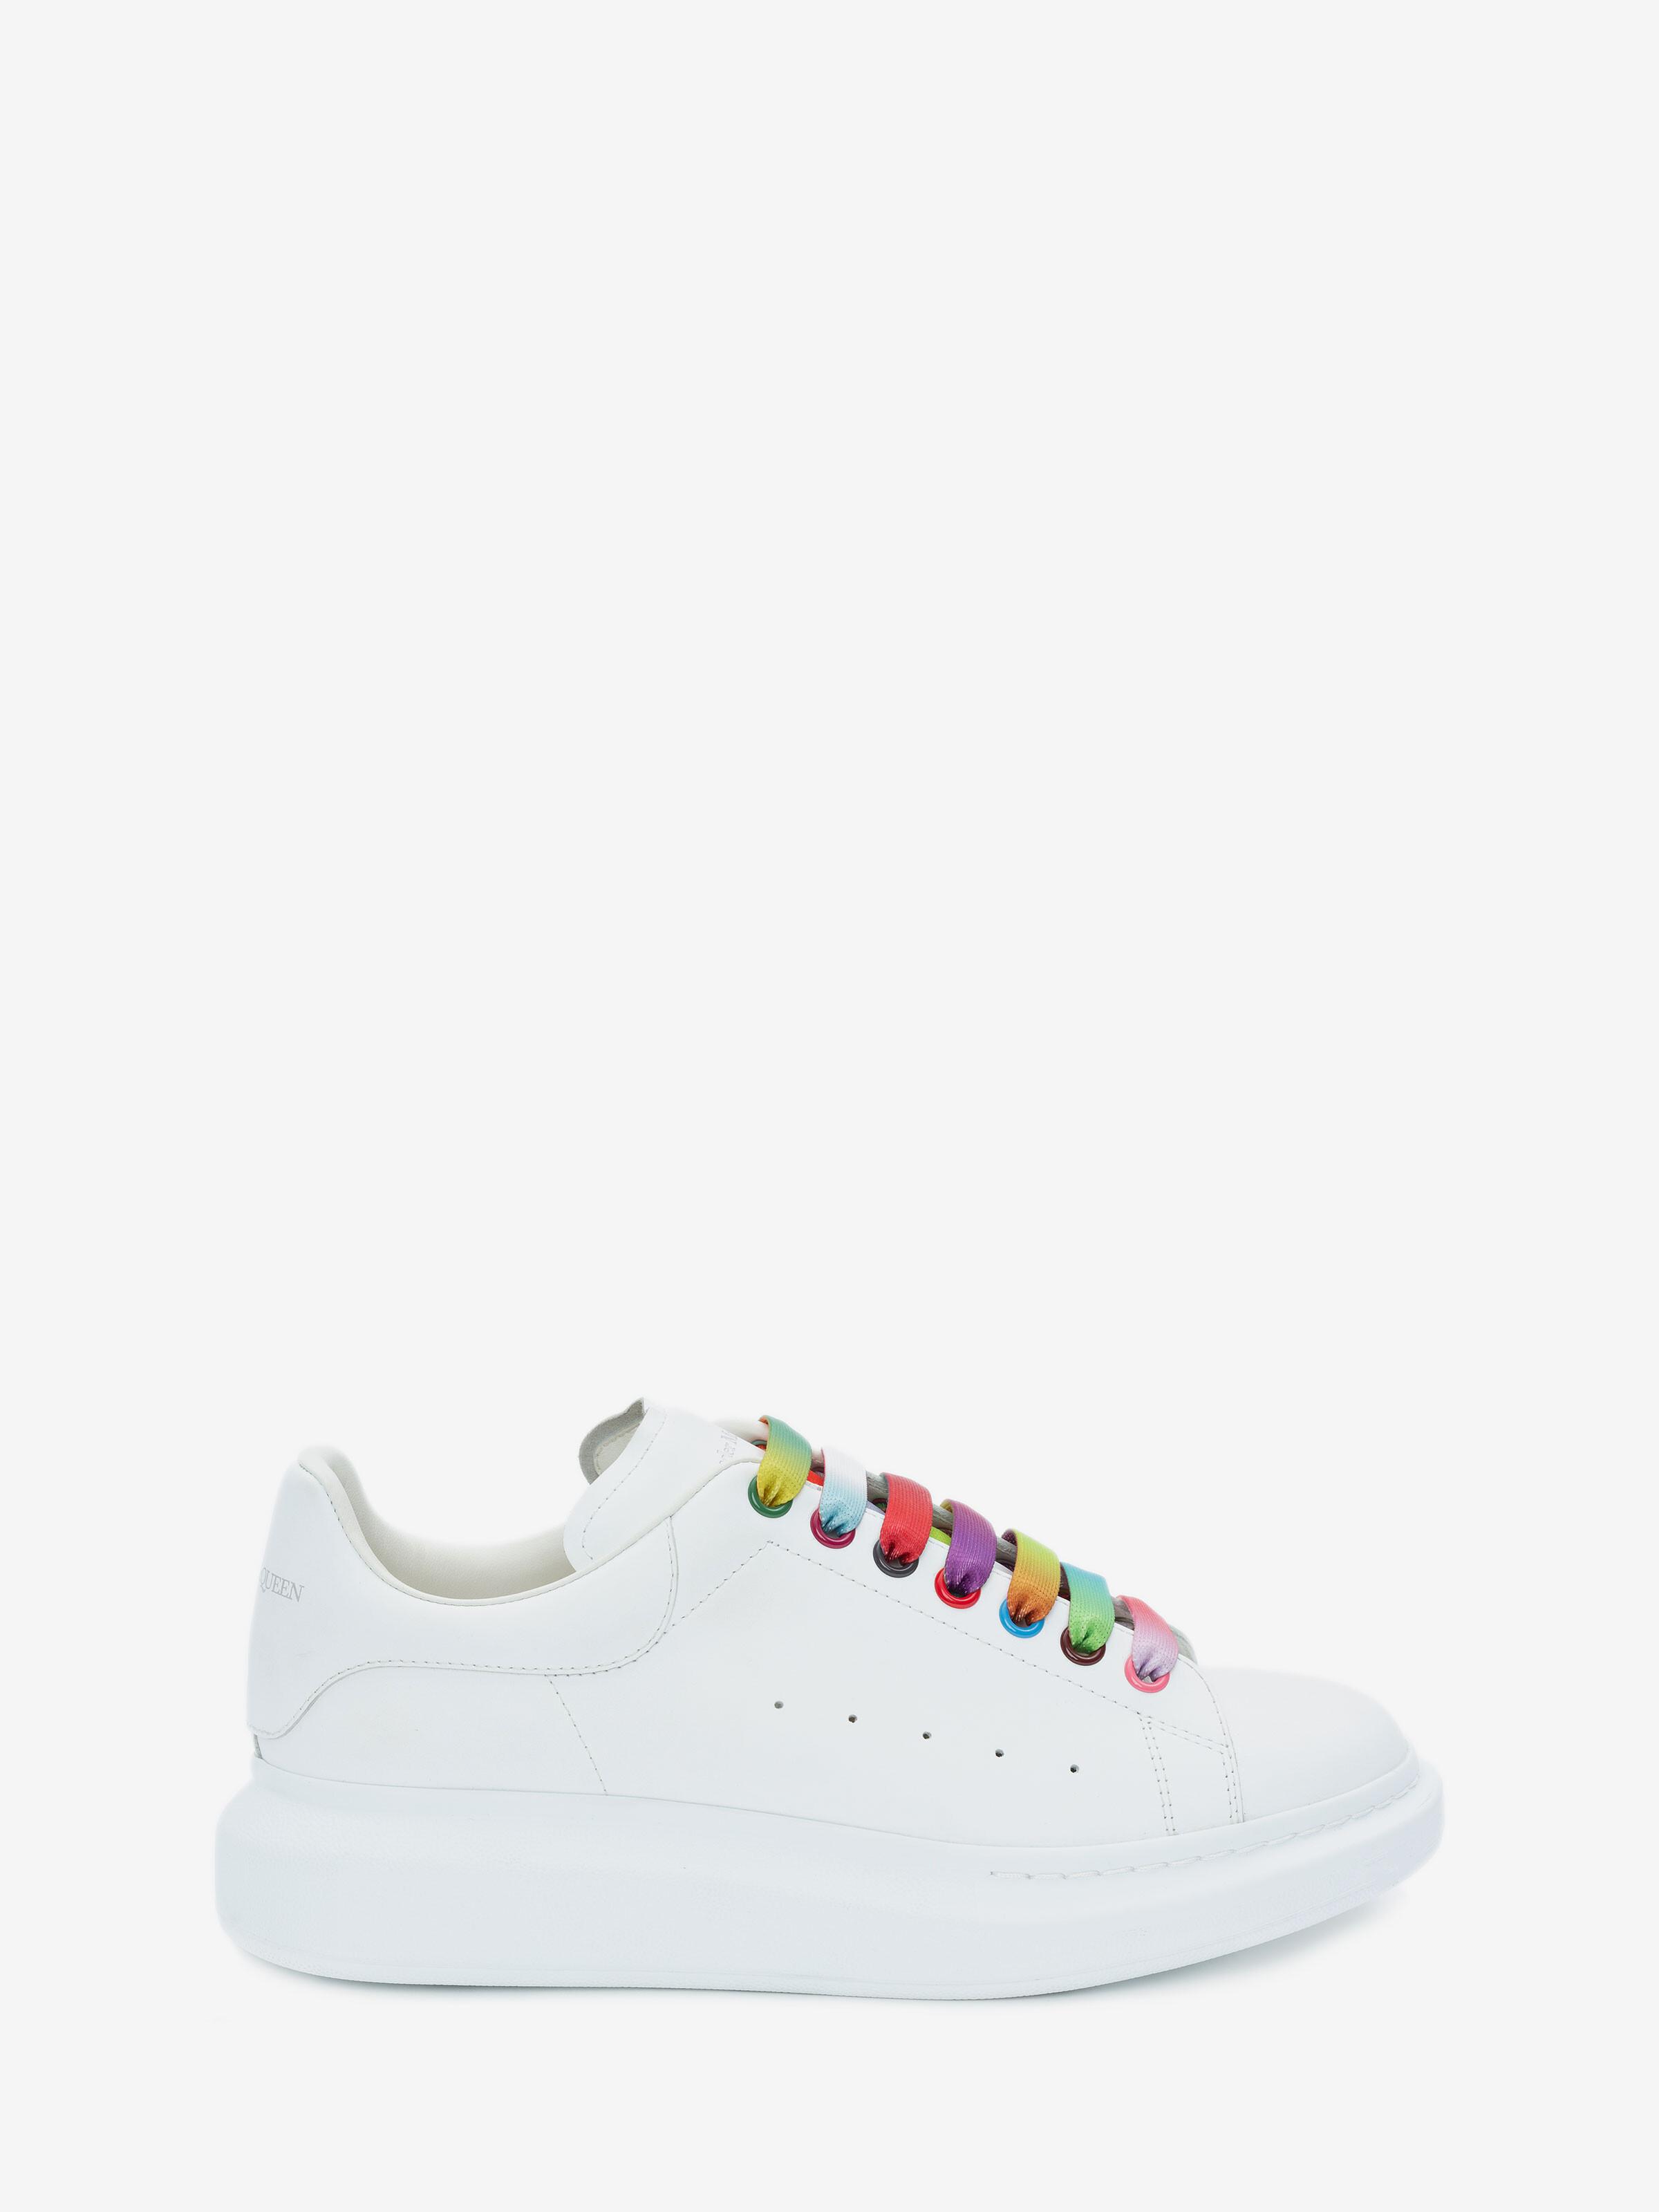 Oversized Sneaker in White/Multicolor